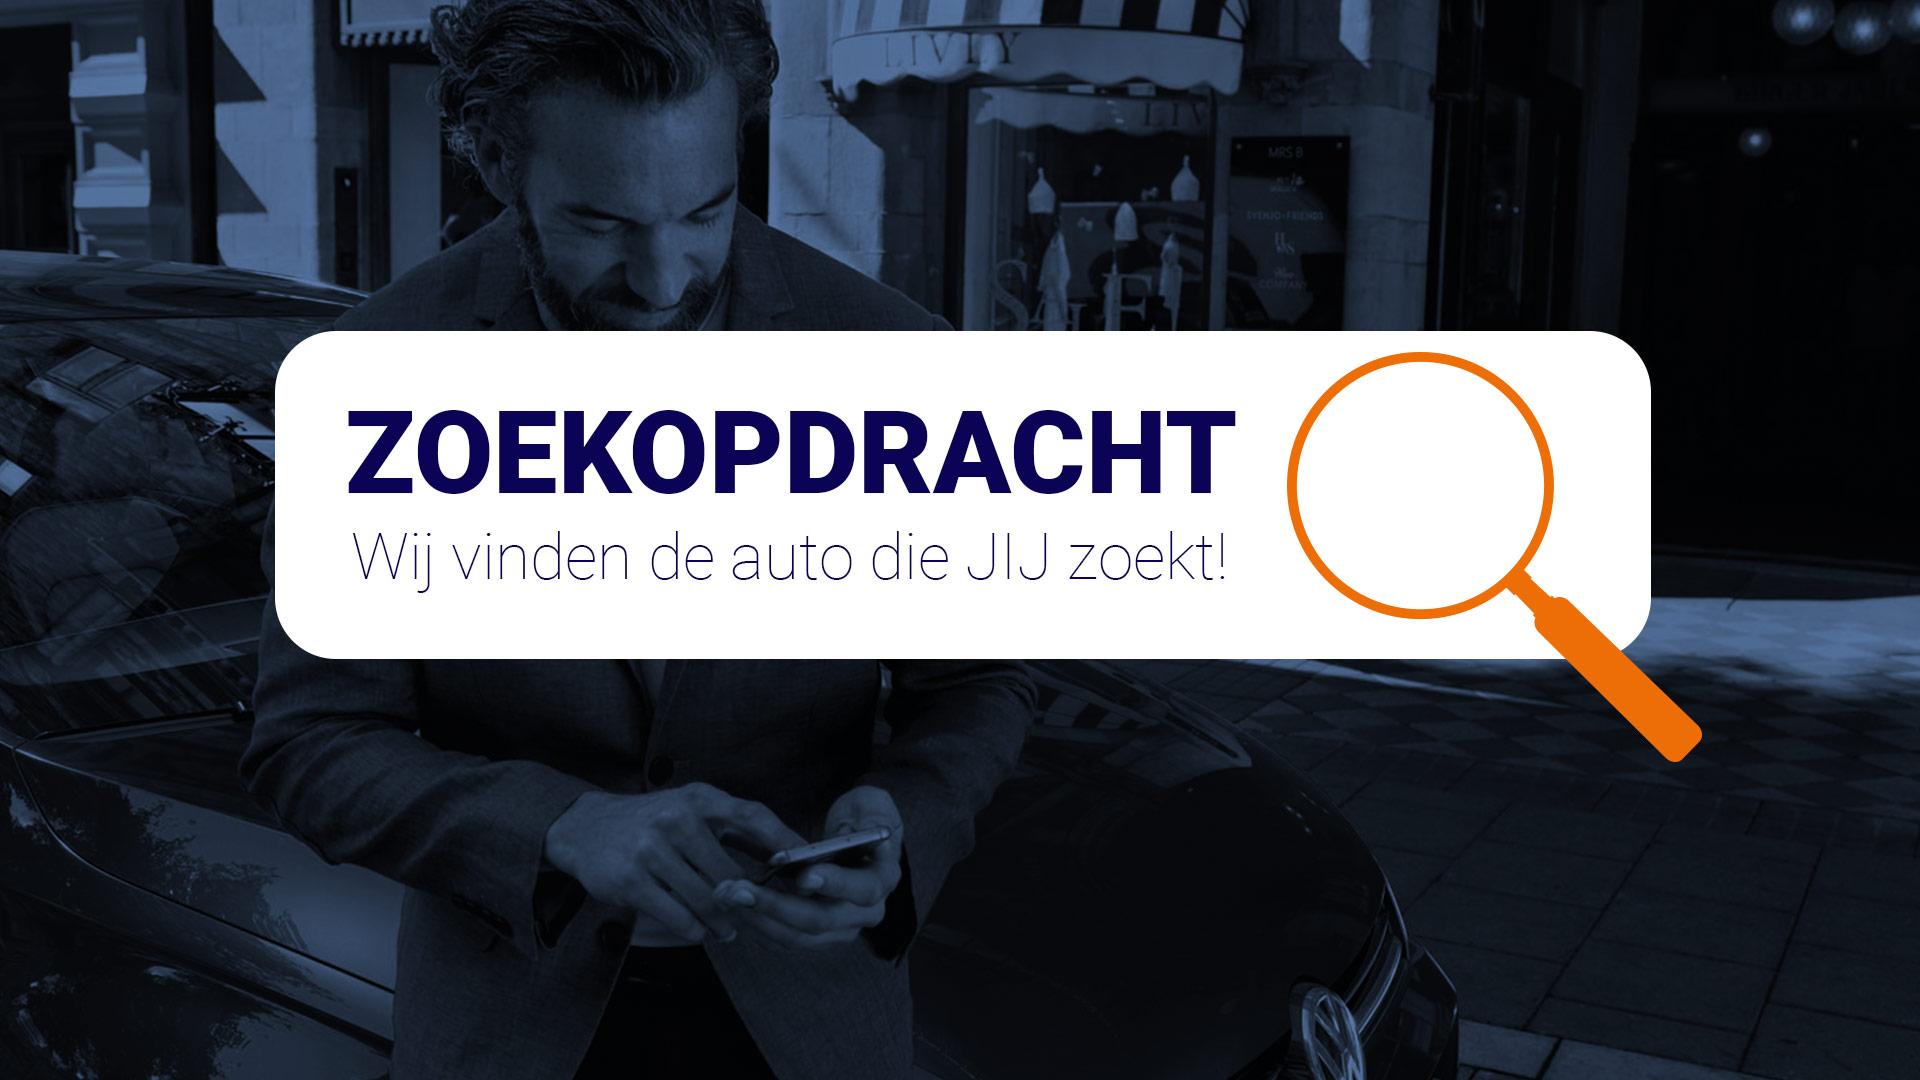 Visual-Zoekopdracht-VW.jpg